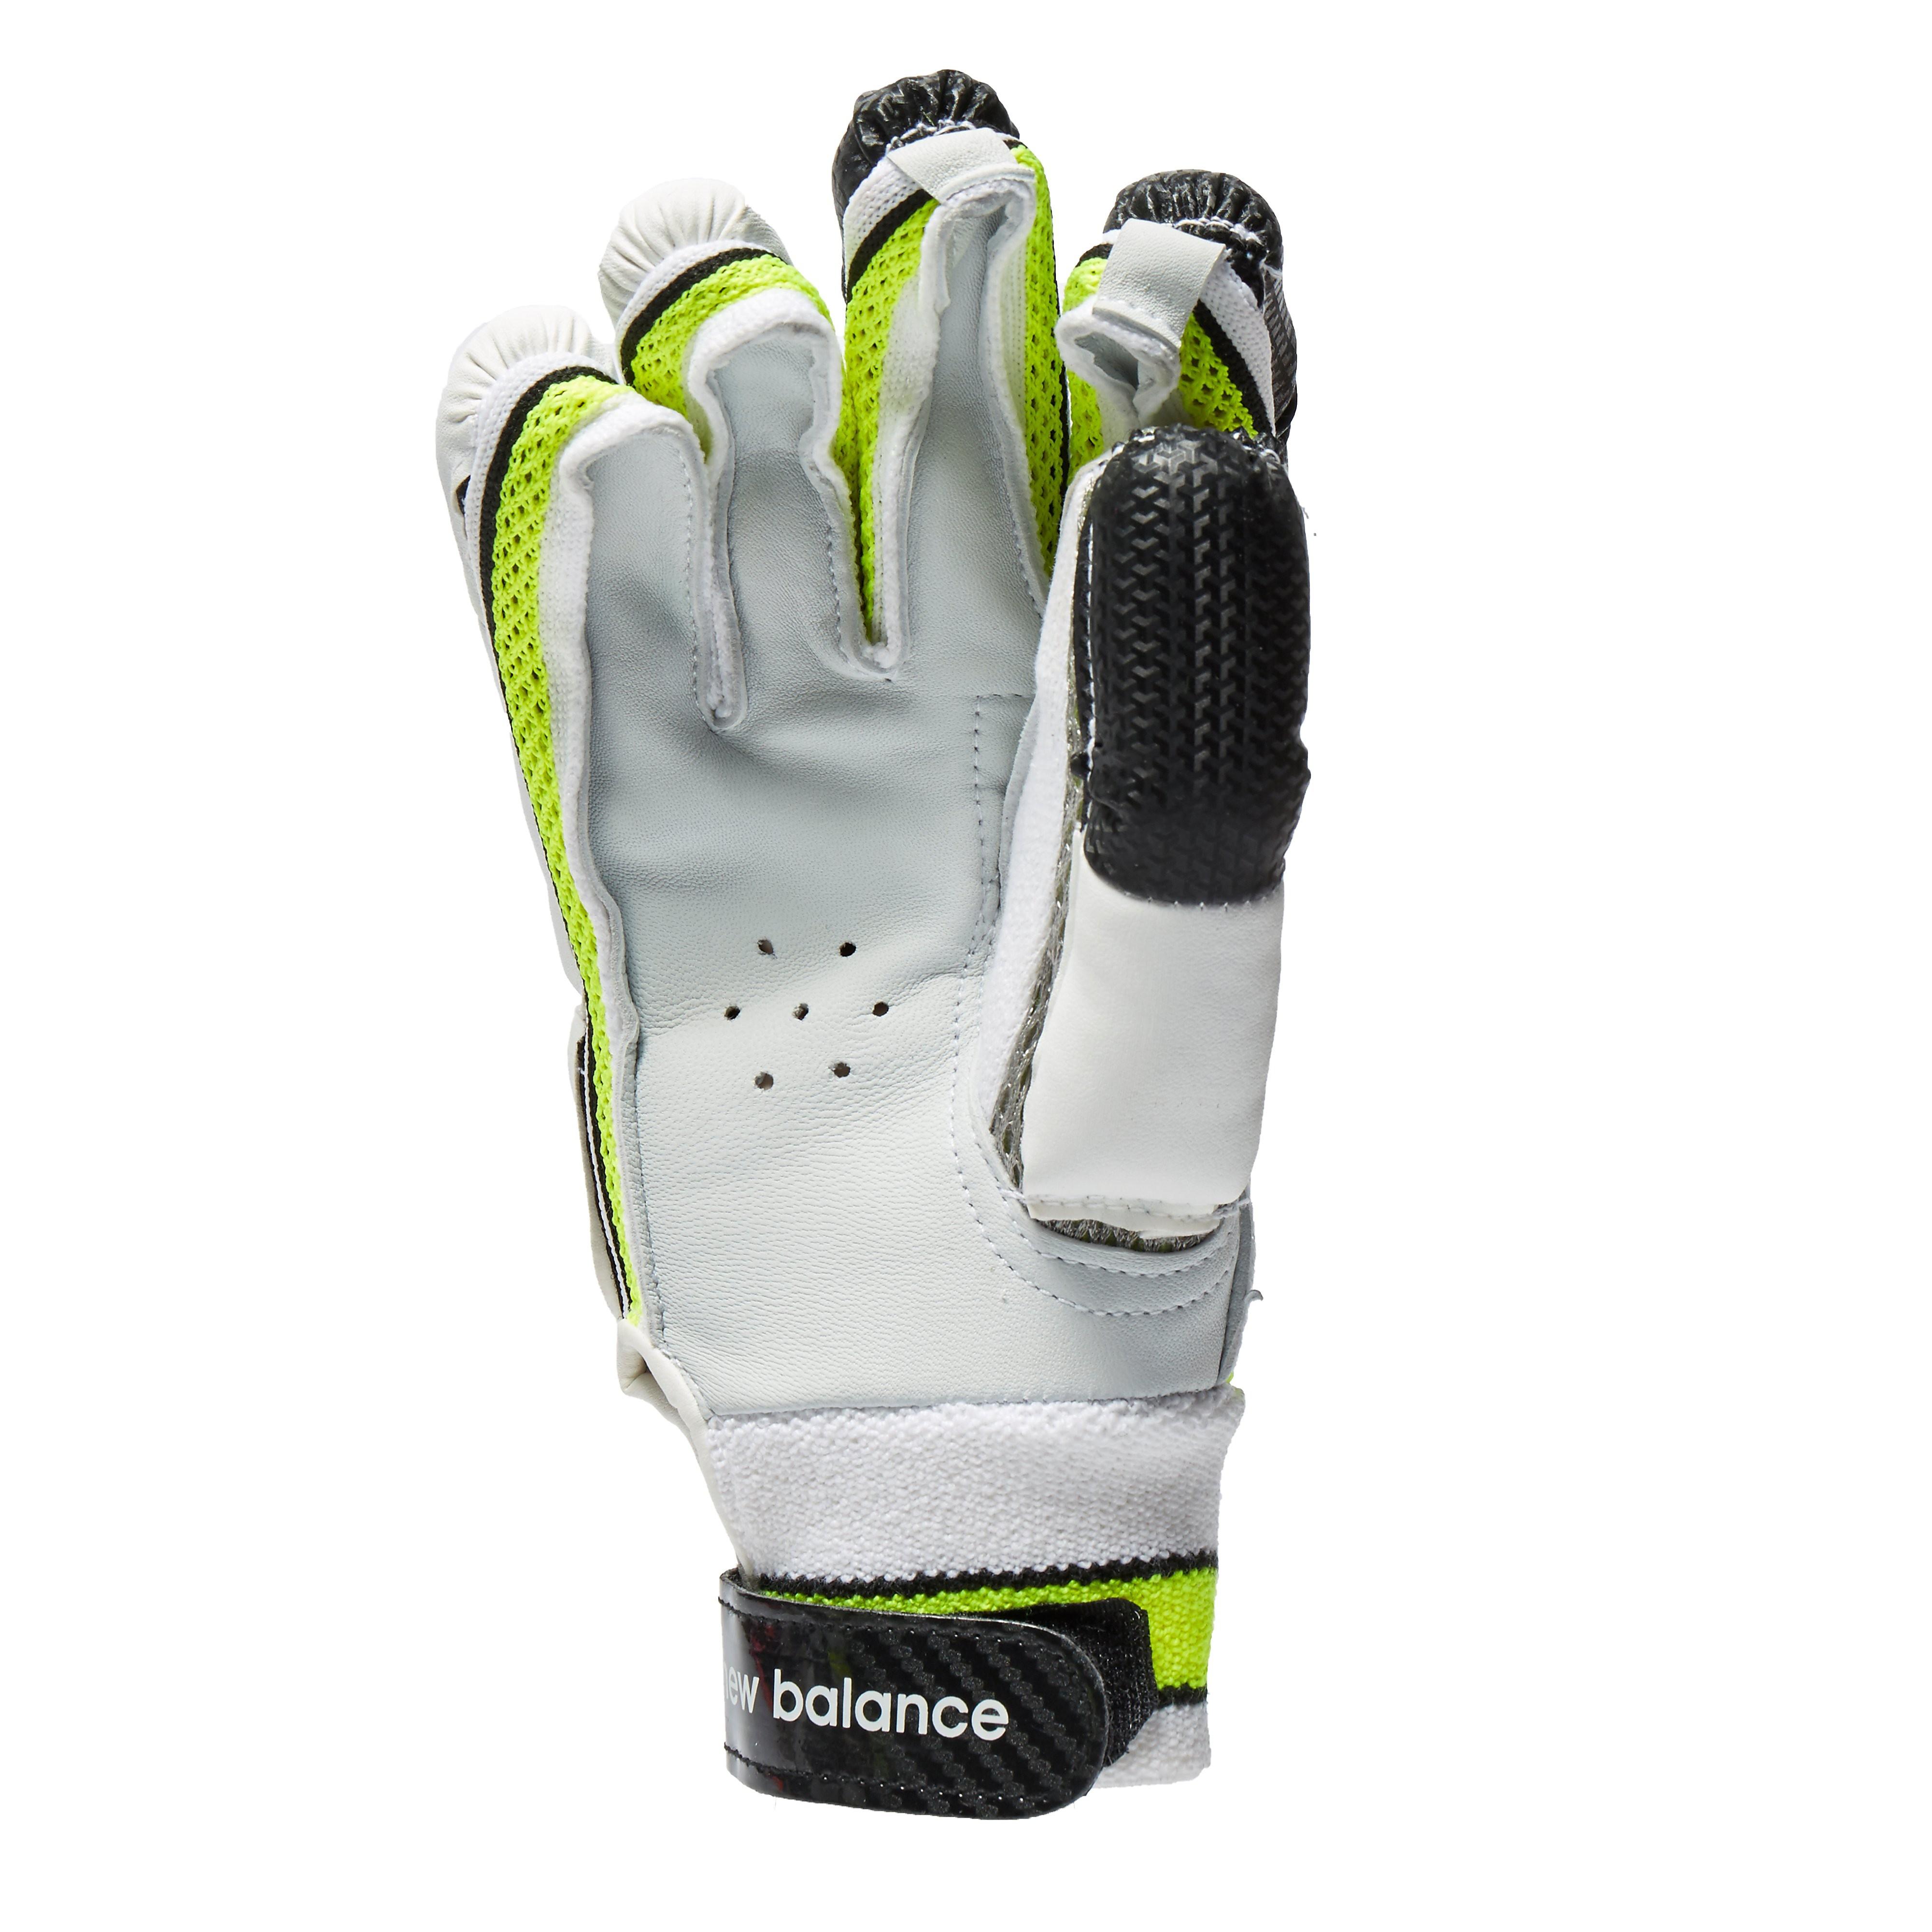 New Balance Dc 380 Junior Batting Gloves